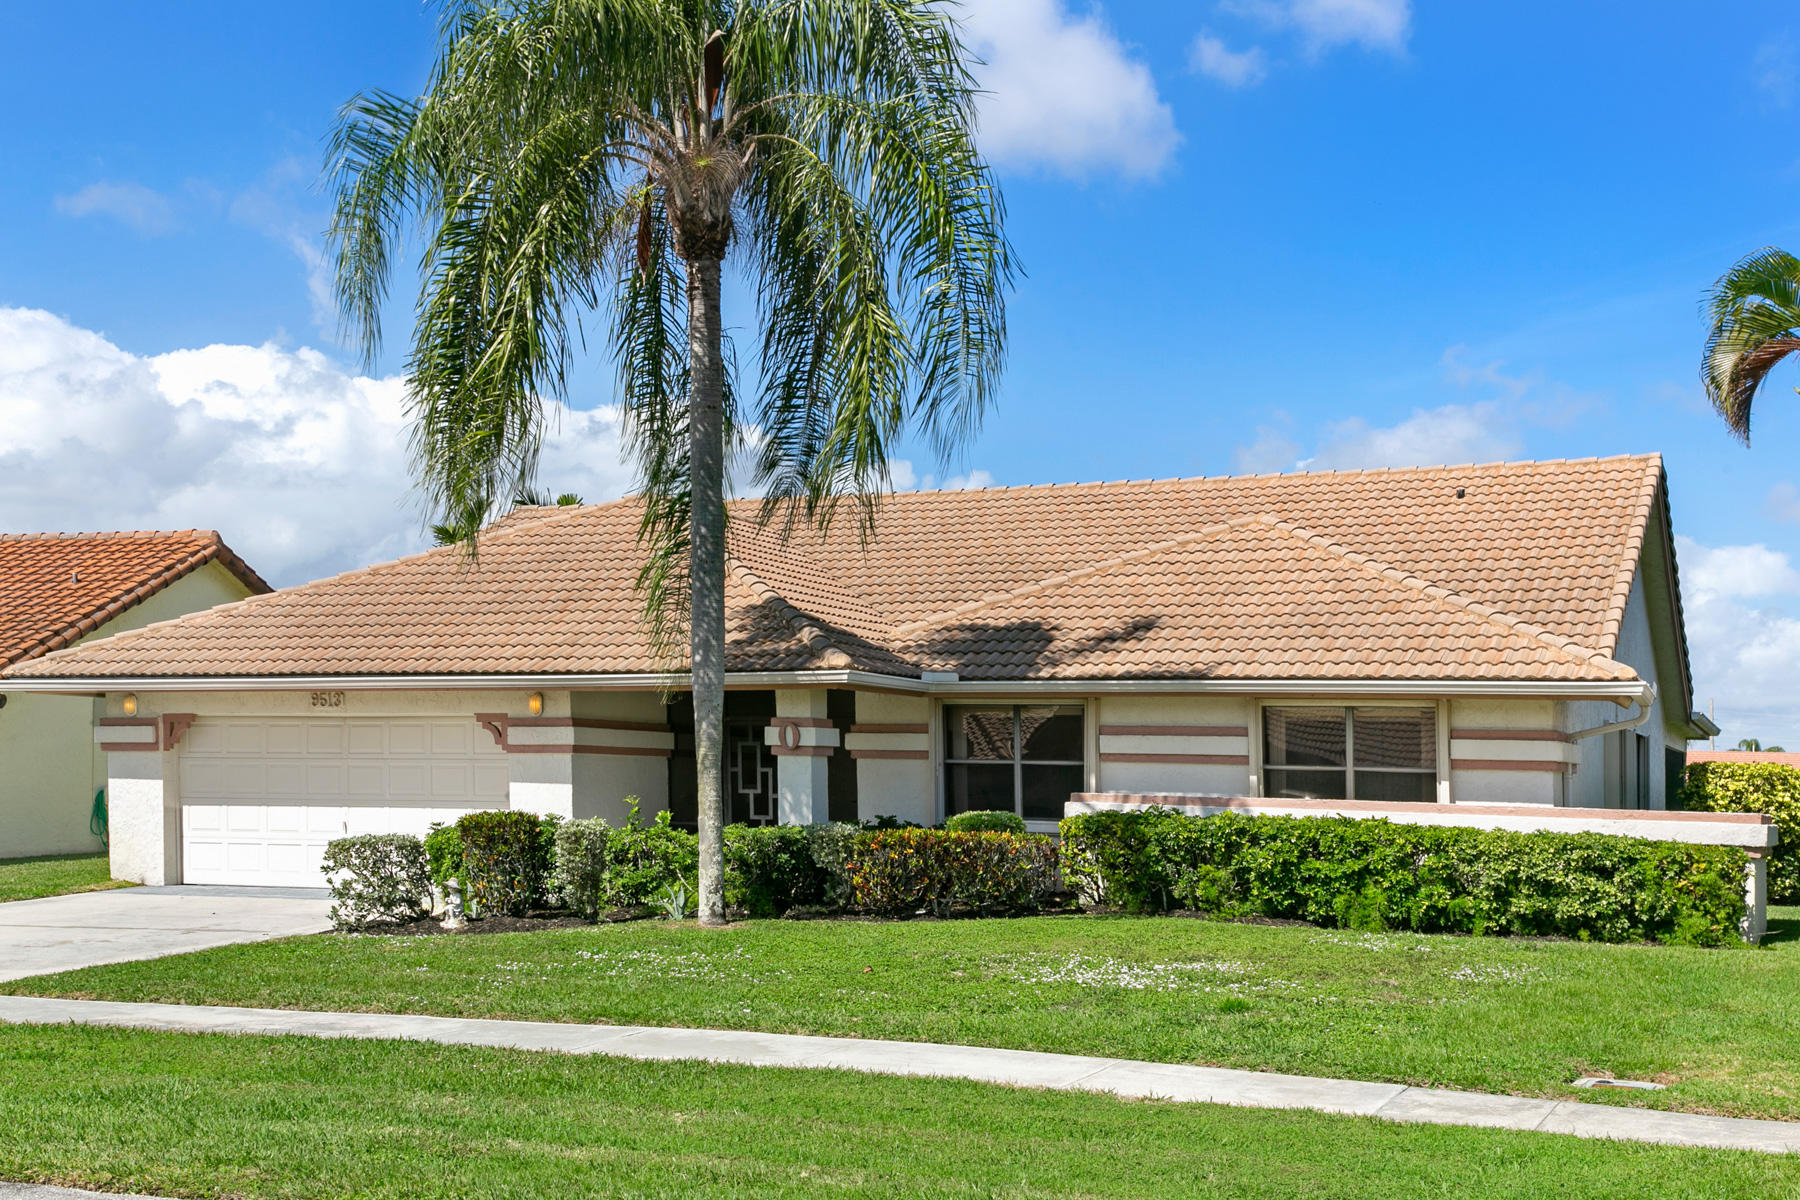 9513 Majestic Way  Boynton Beach FL 33437